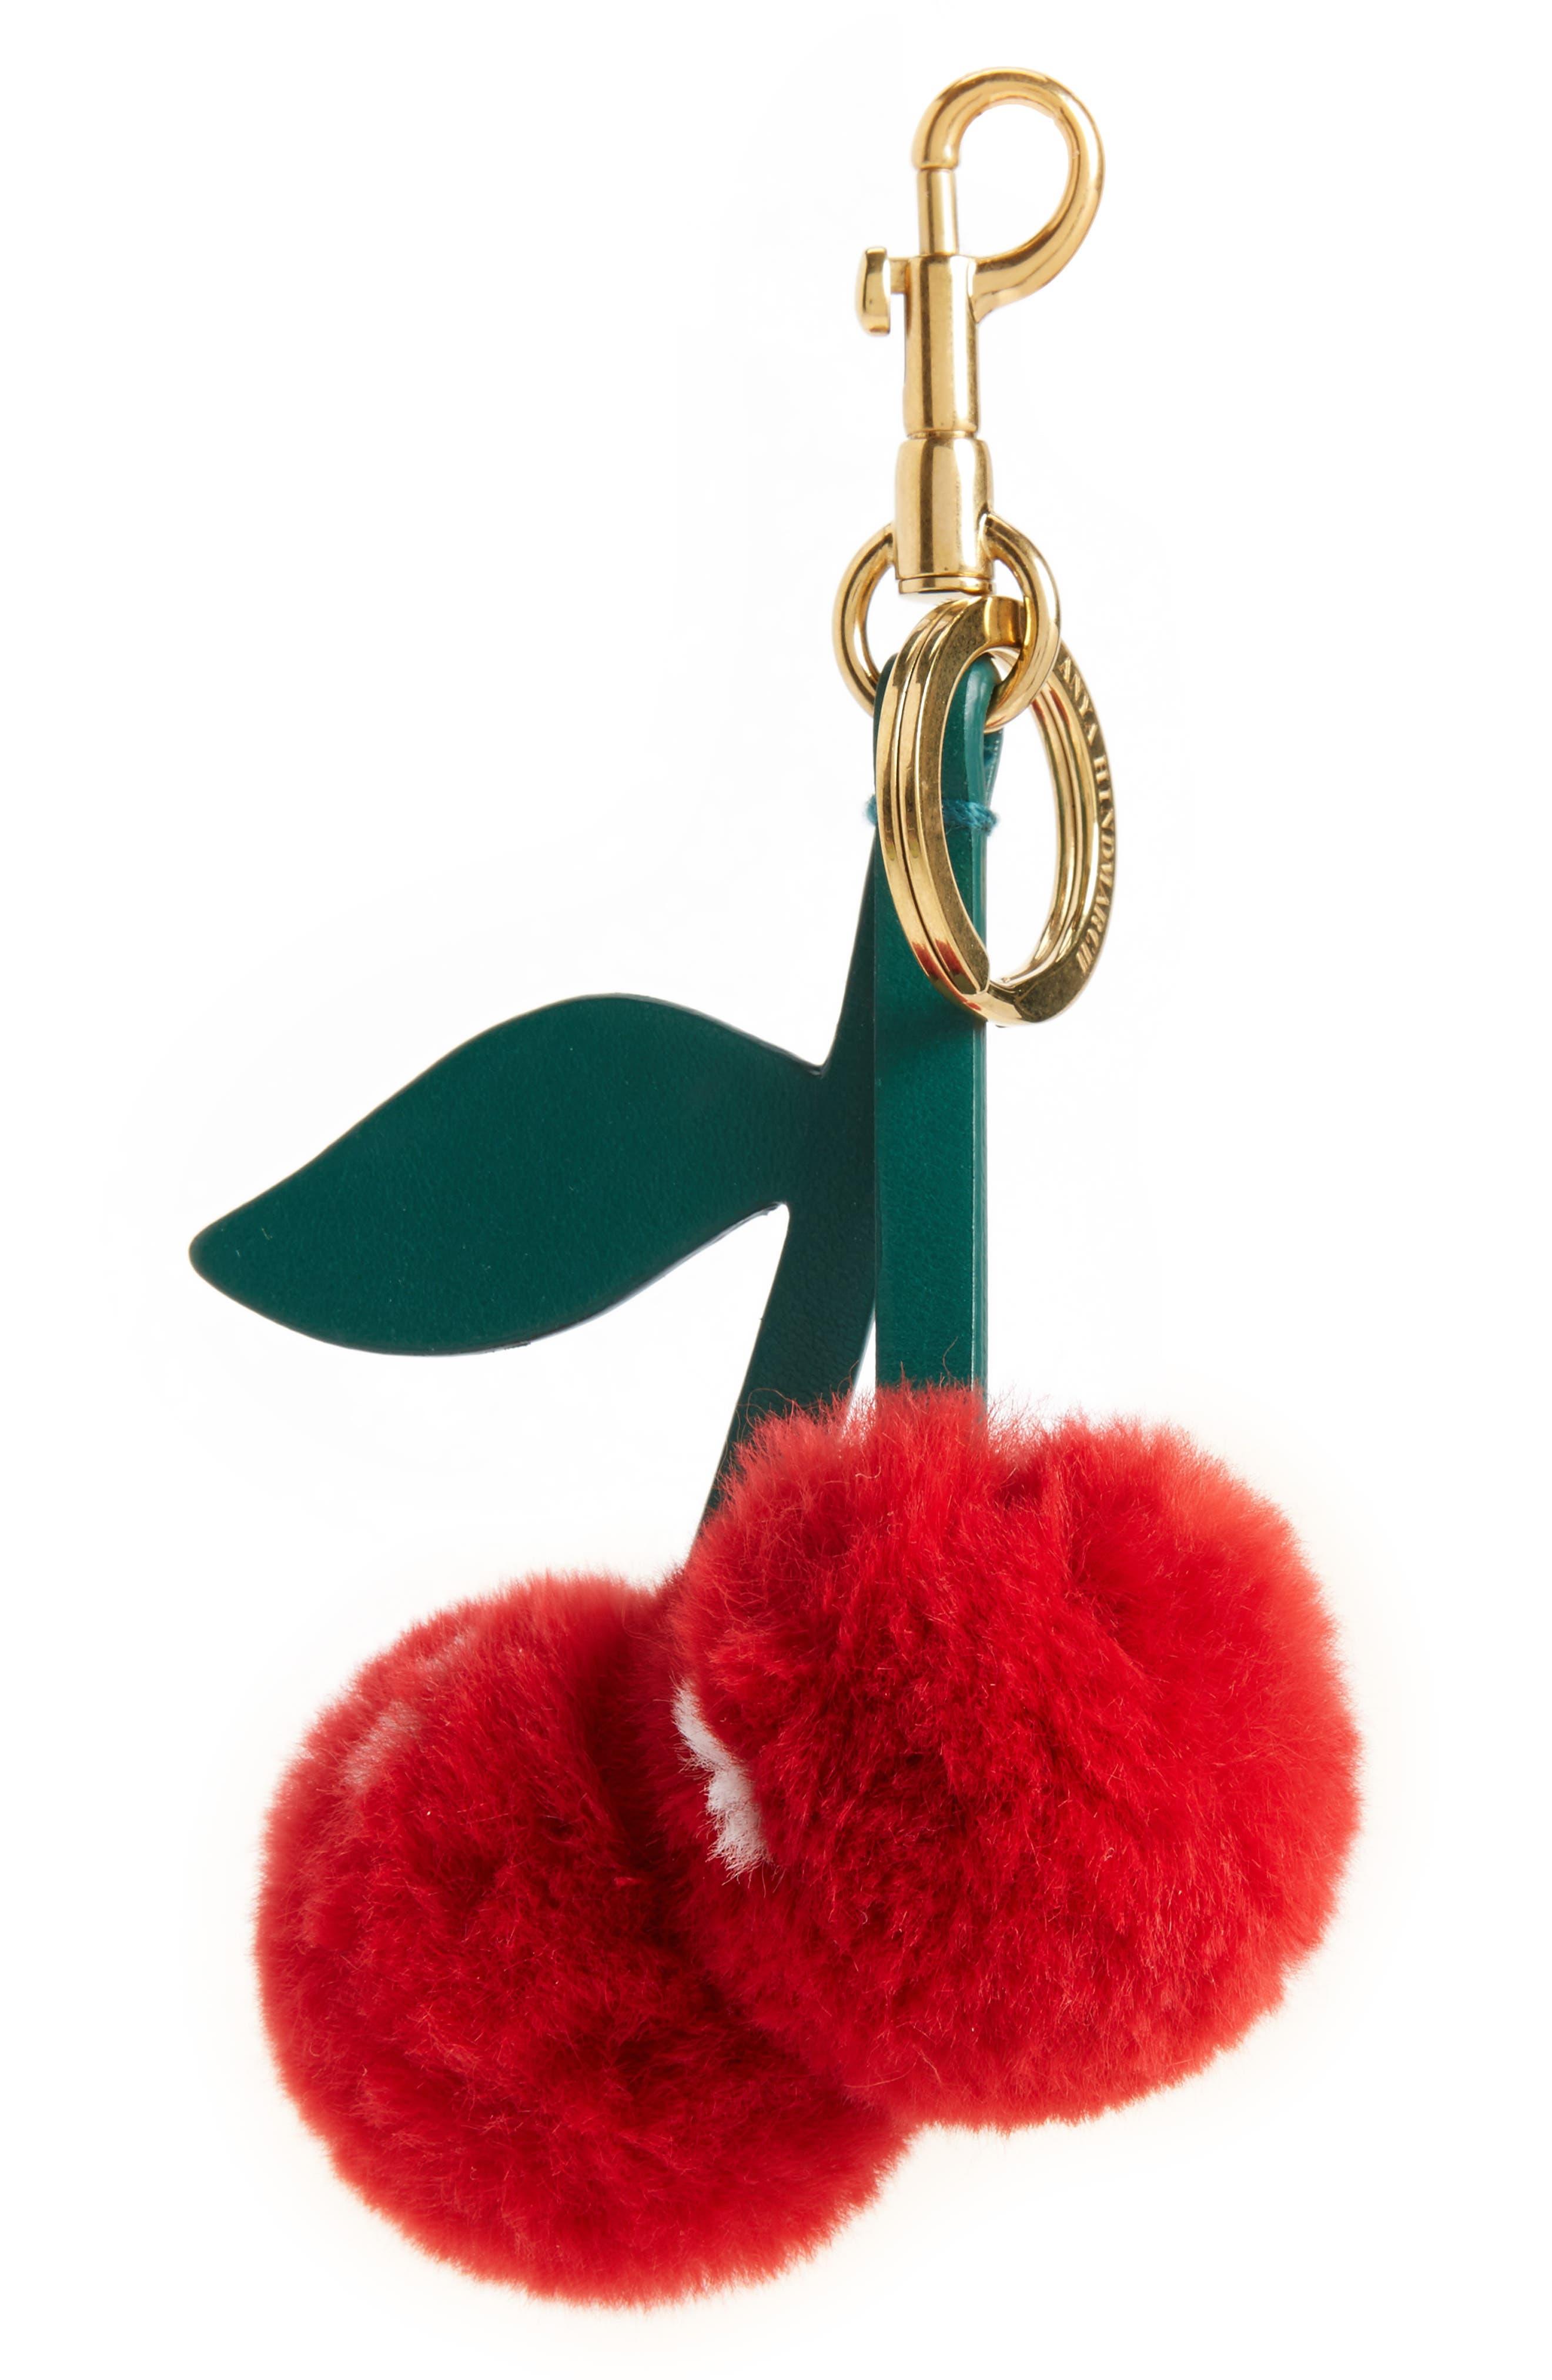 Main Image - Anya Hindmarch Cherry Genuine Rabbit Fur Bag Charm